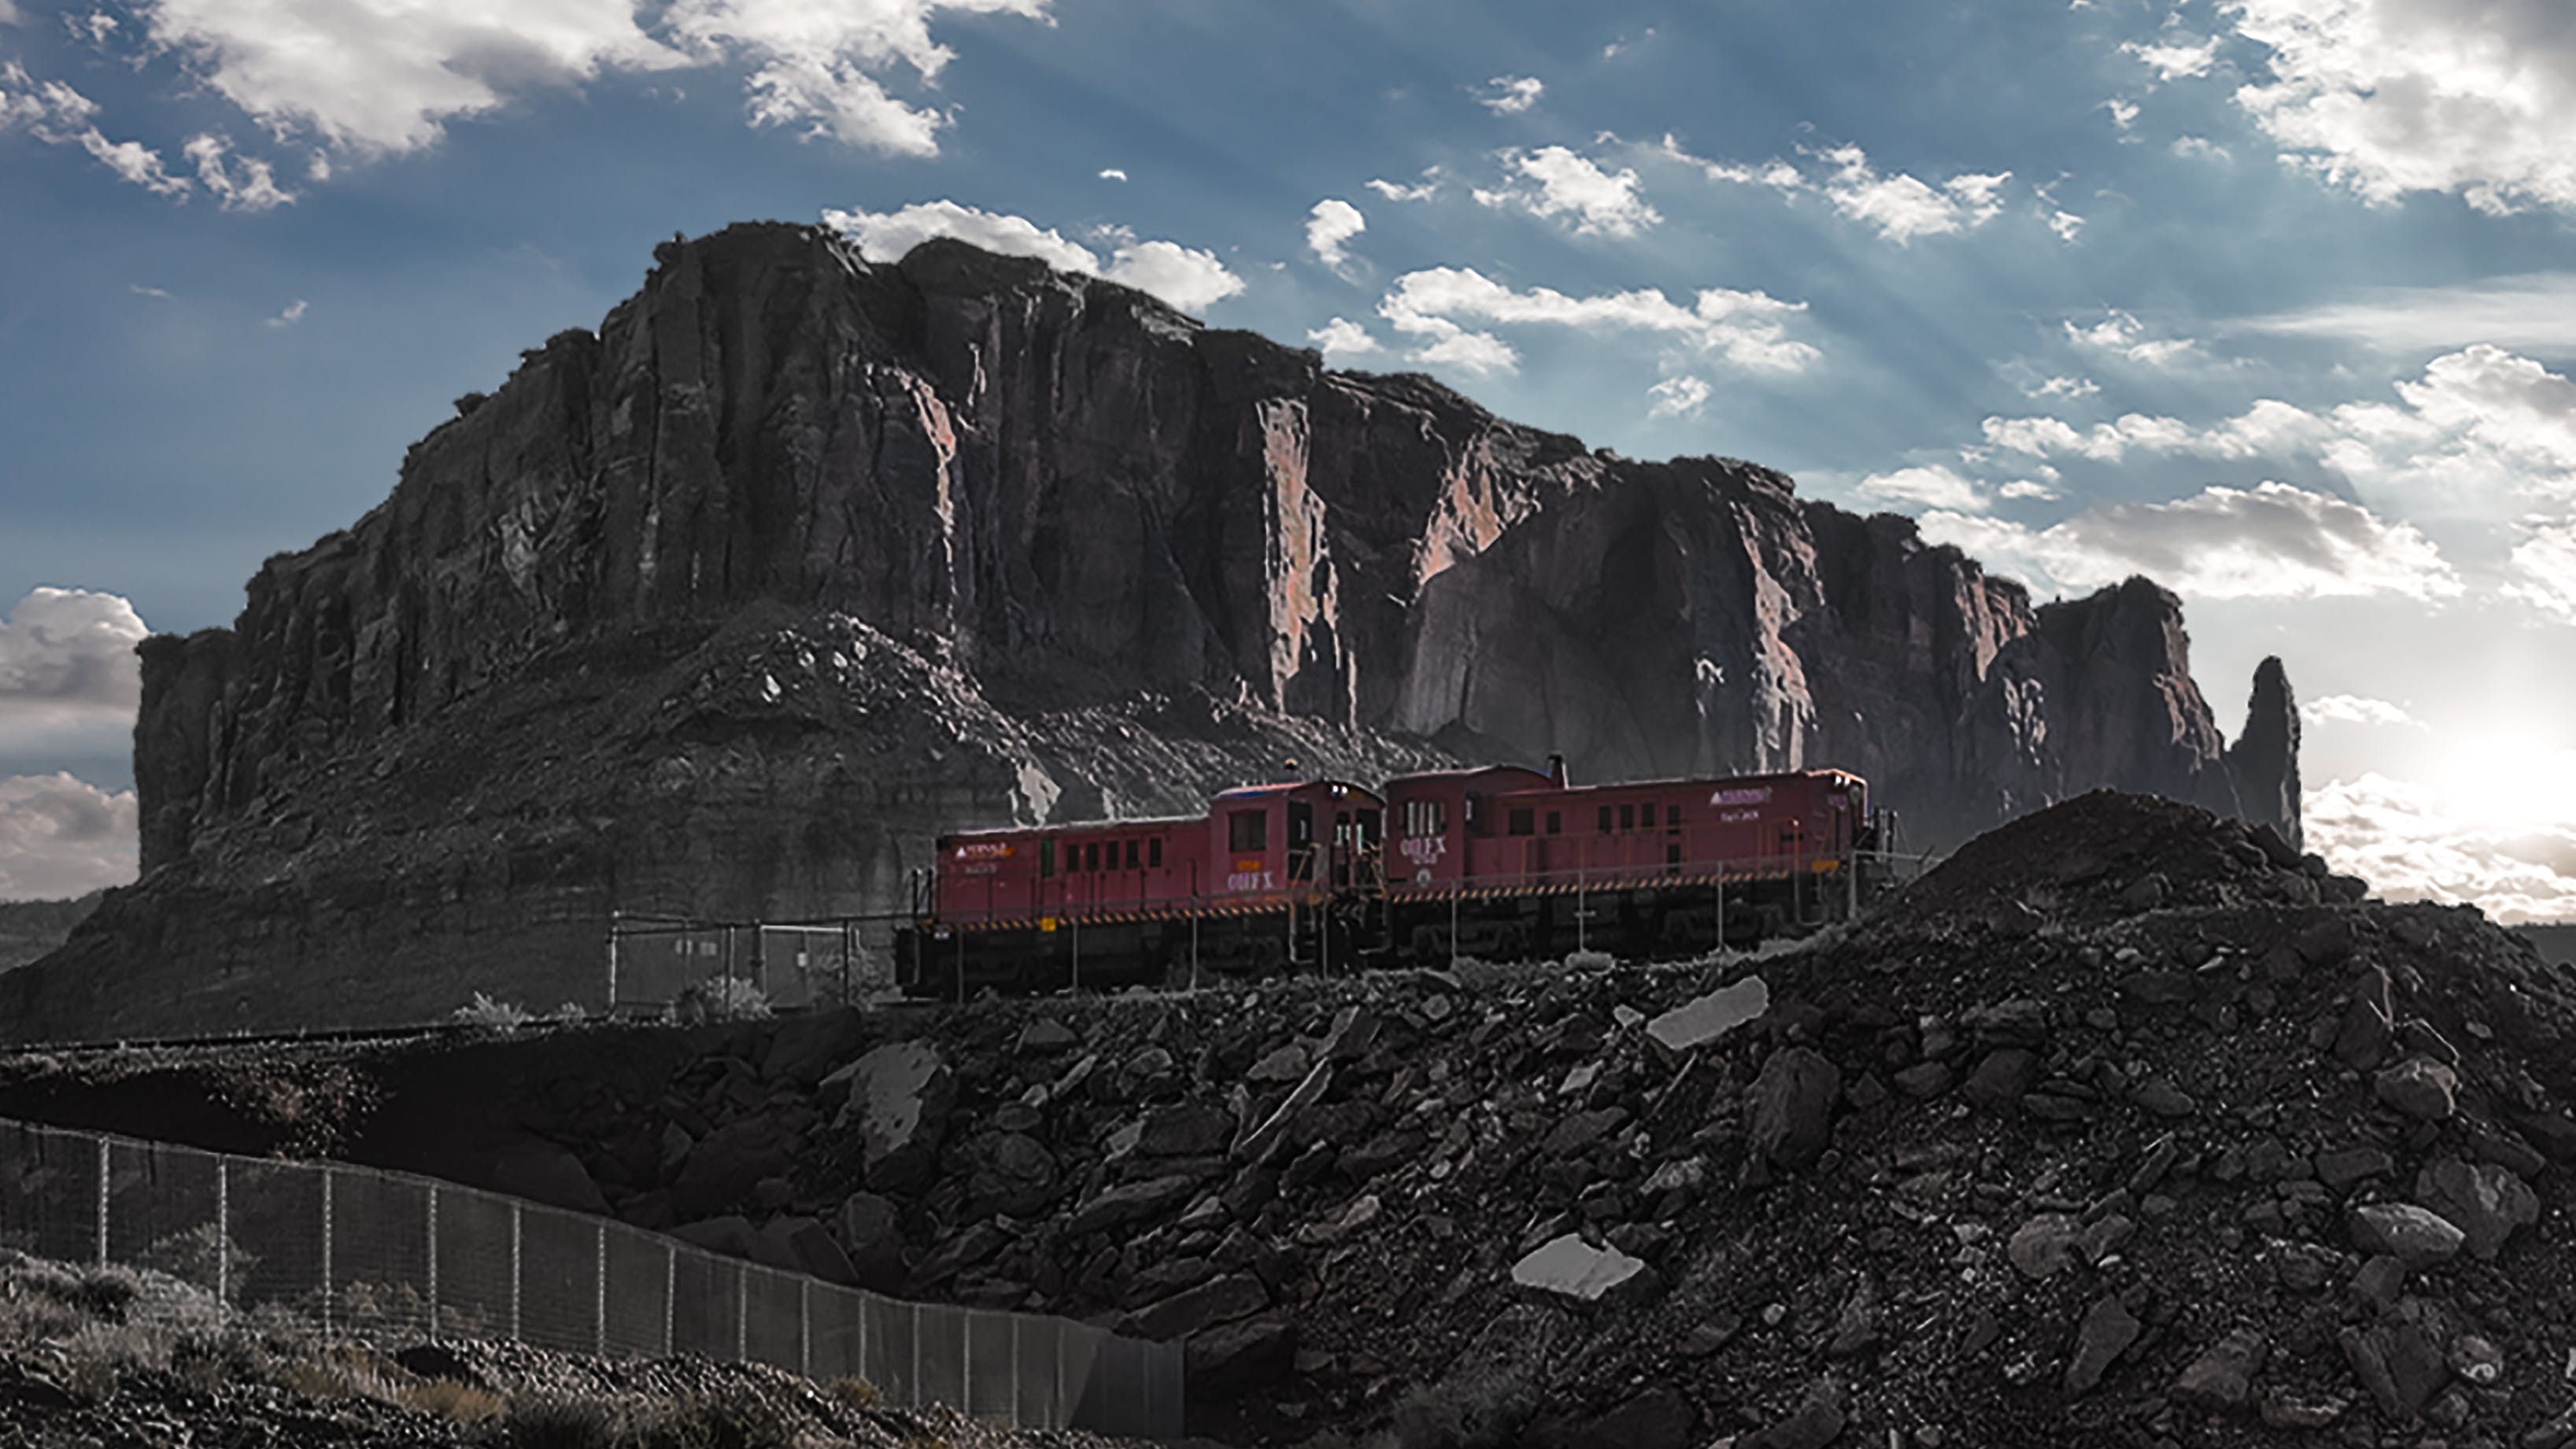 Free stock photo of moab, train, train tracks, utah